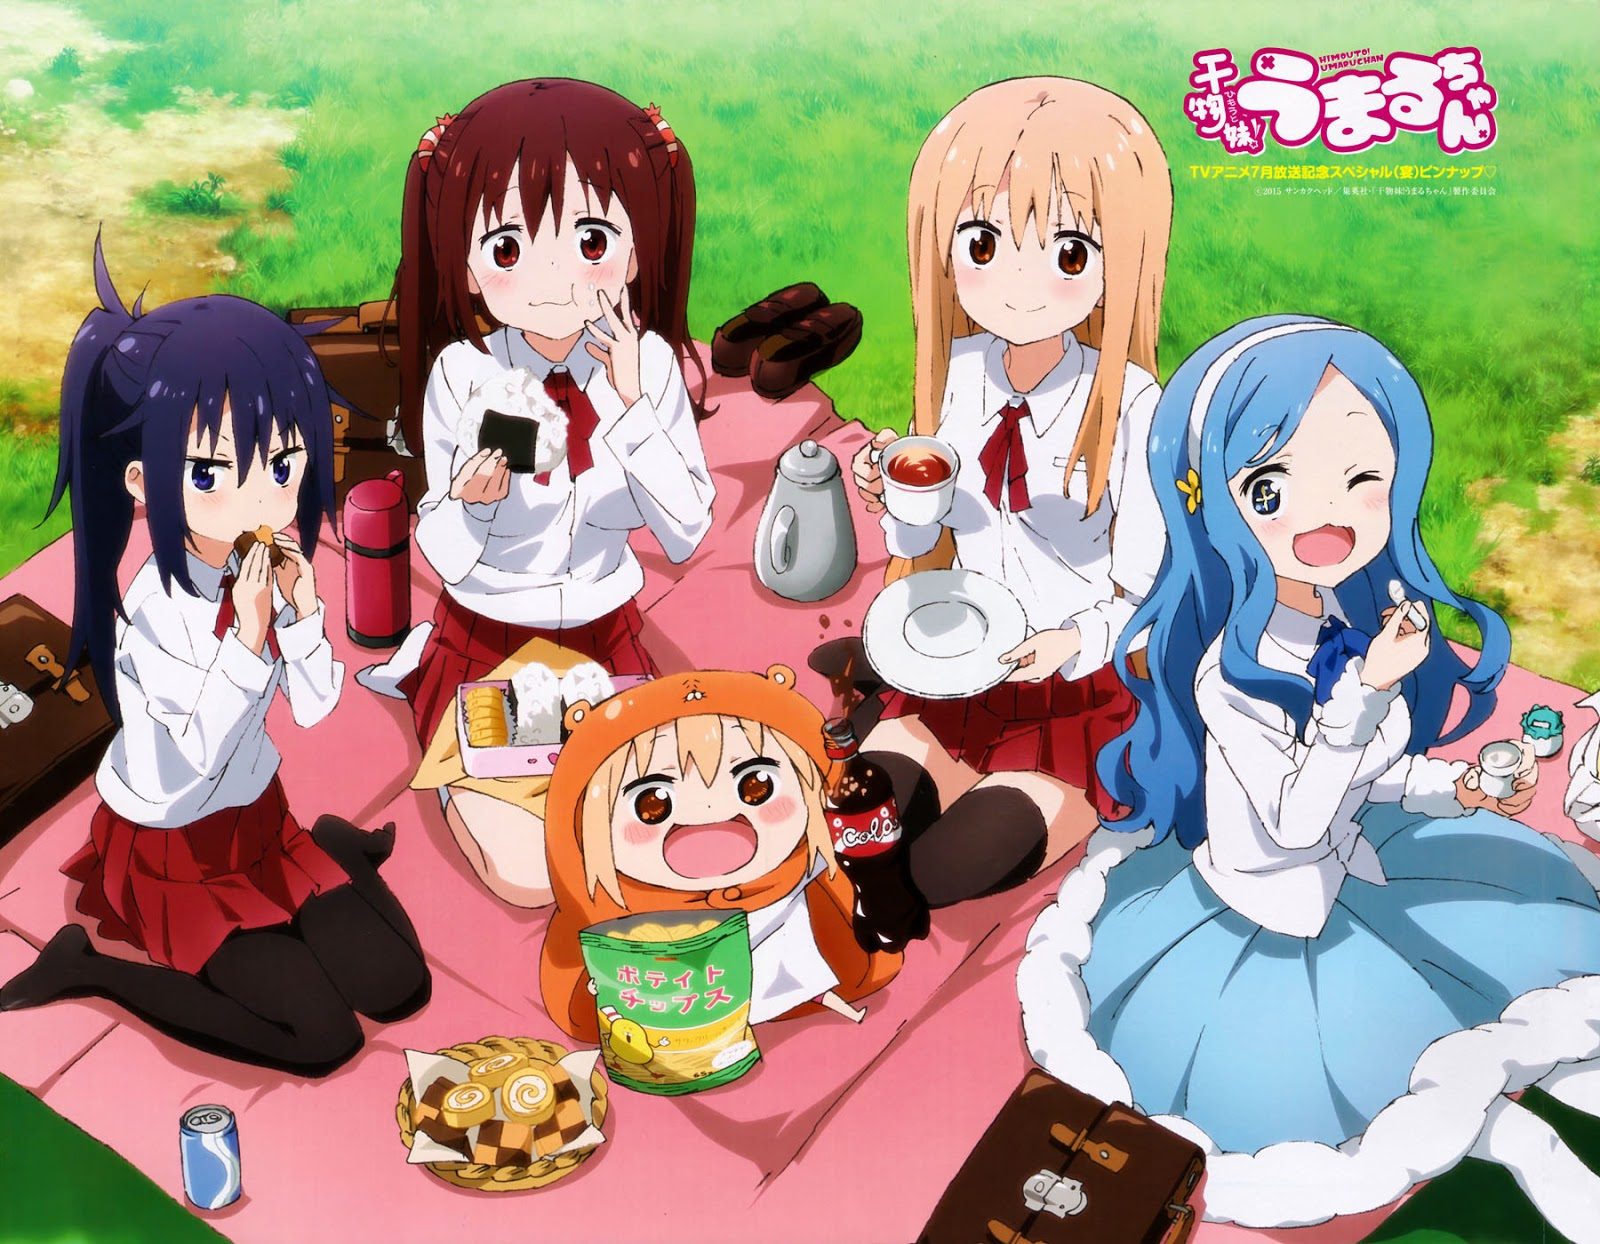 Ost Opening And Ending Anime Himouto Umaru Chan